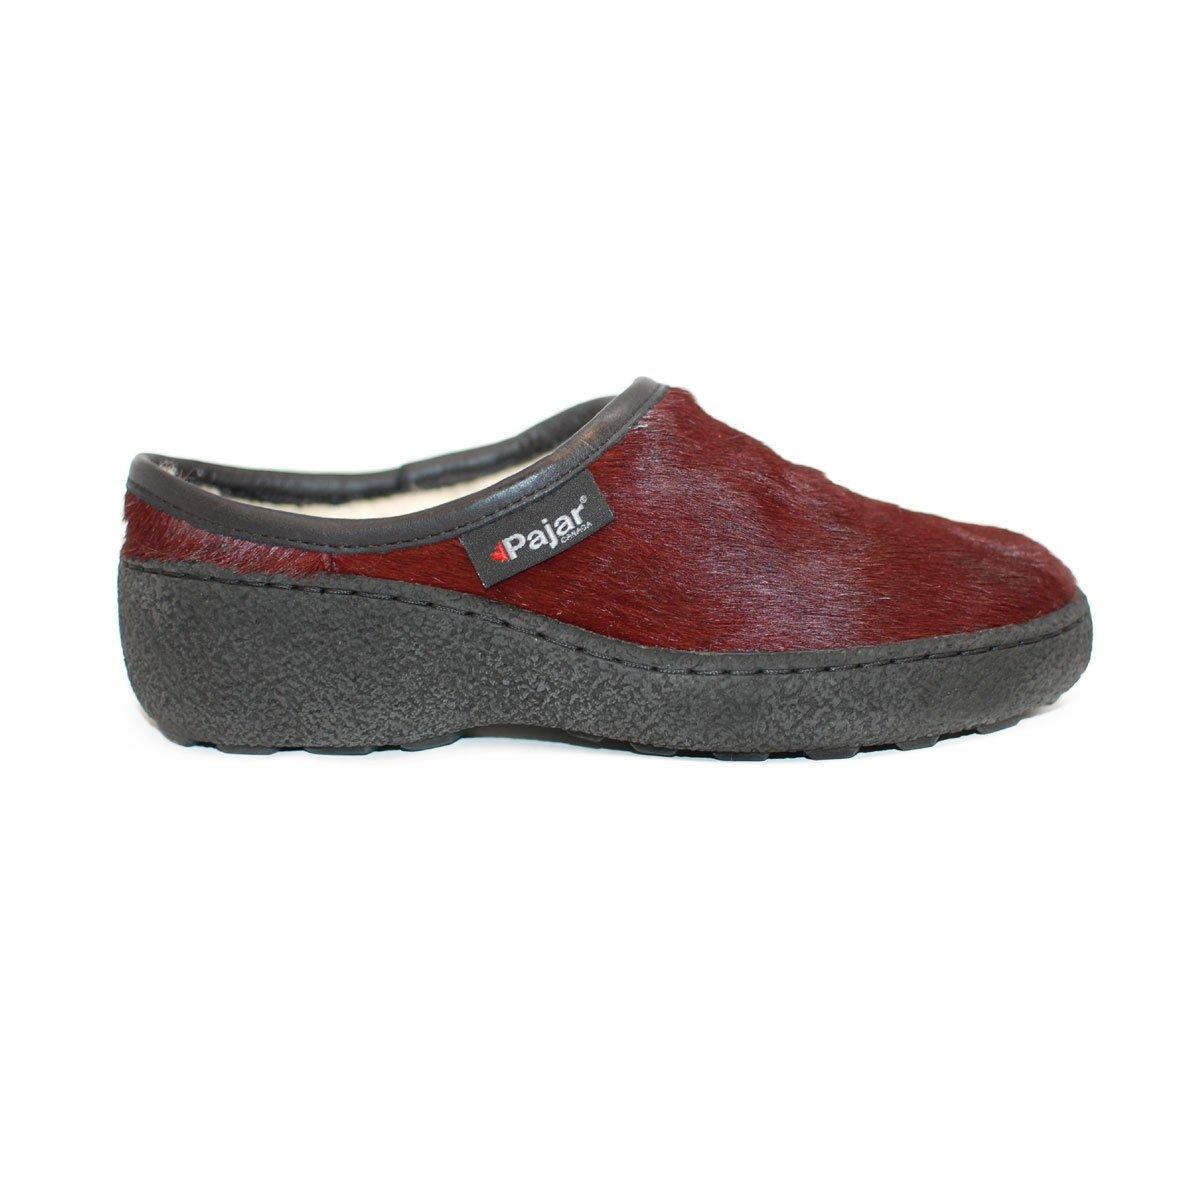 Amazon.com: Pajar Chalet de la mujer Clog: Shoes